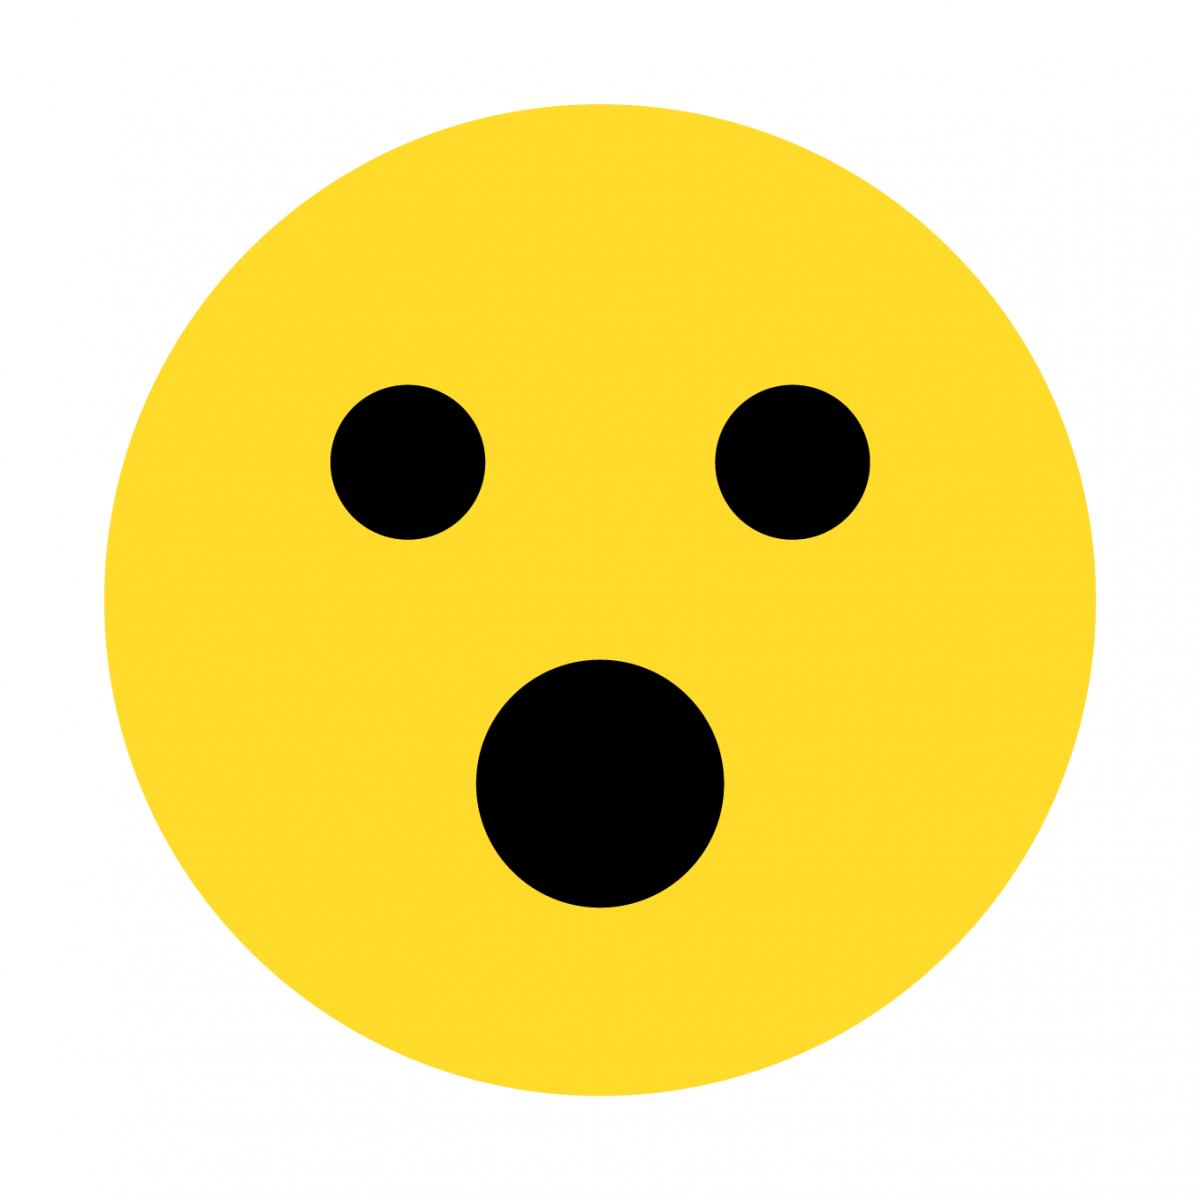 knoooop-sortiment Startseite_smileyomg